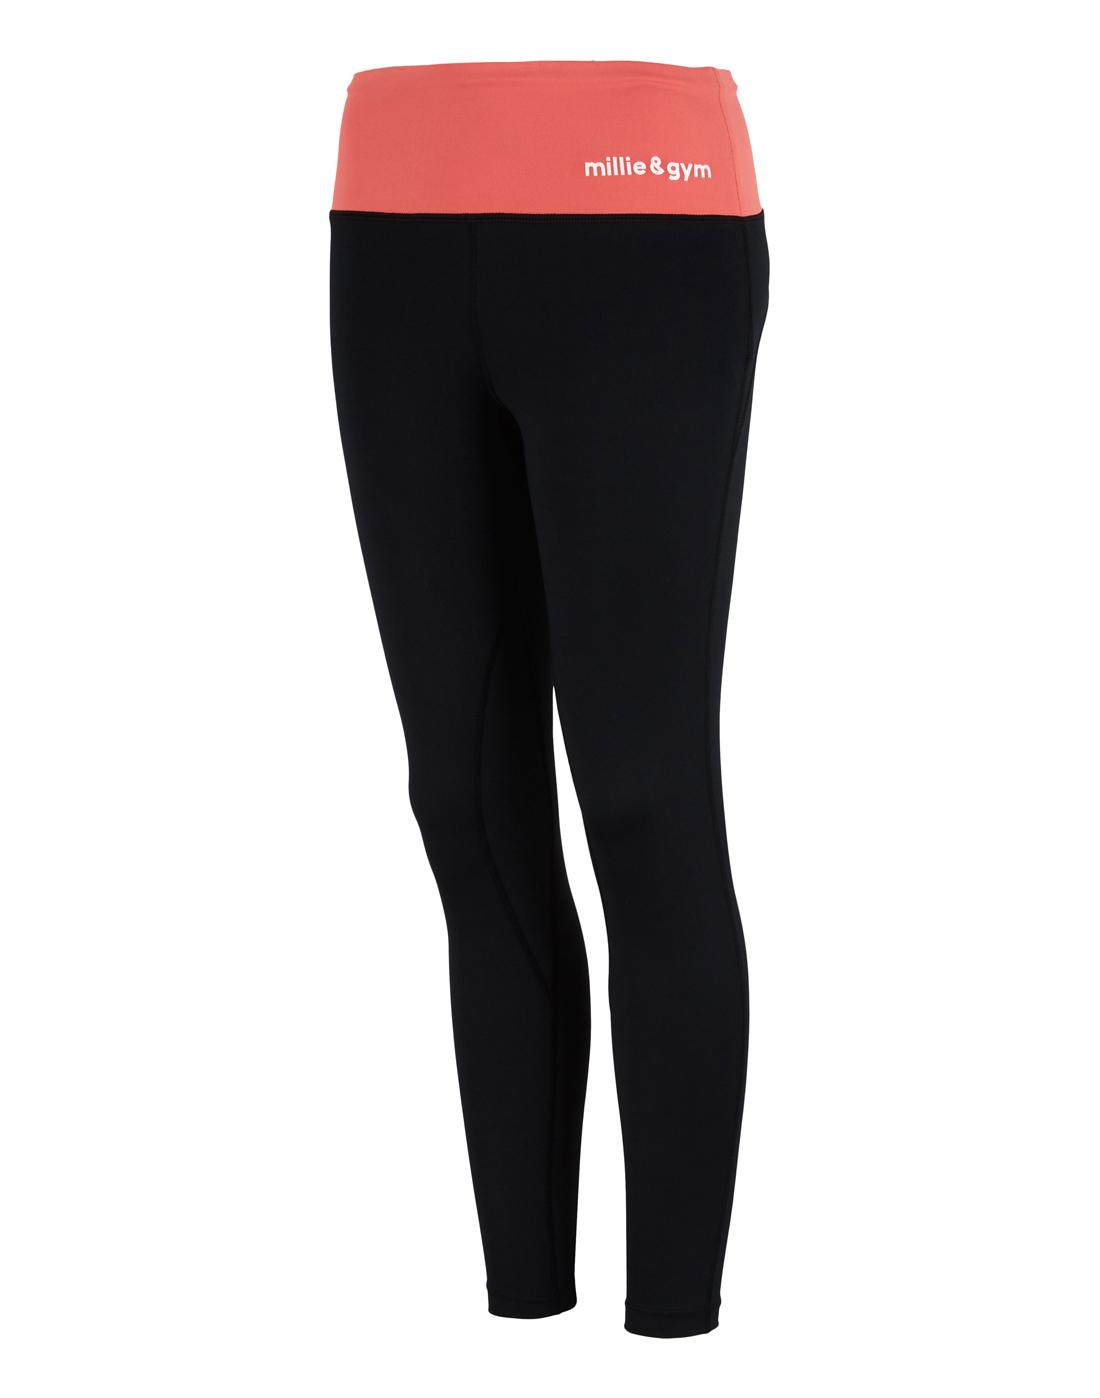 e53c37a95b113 millie & gym Womens Mercury Legging | Life Style Sports